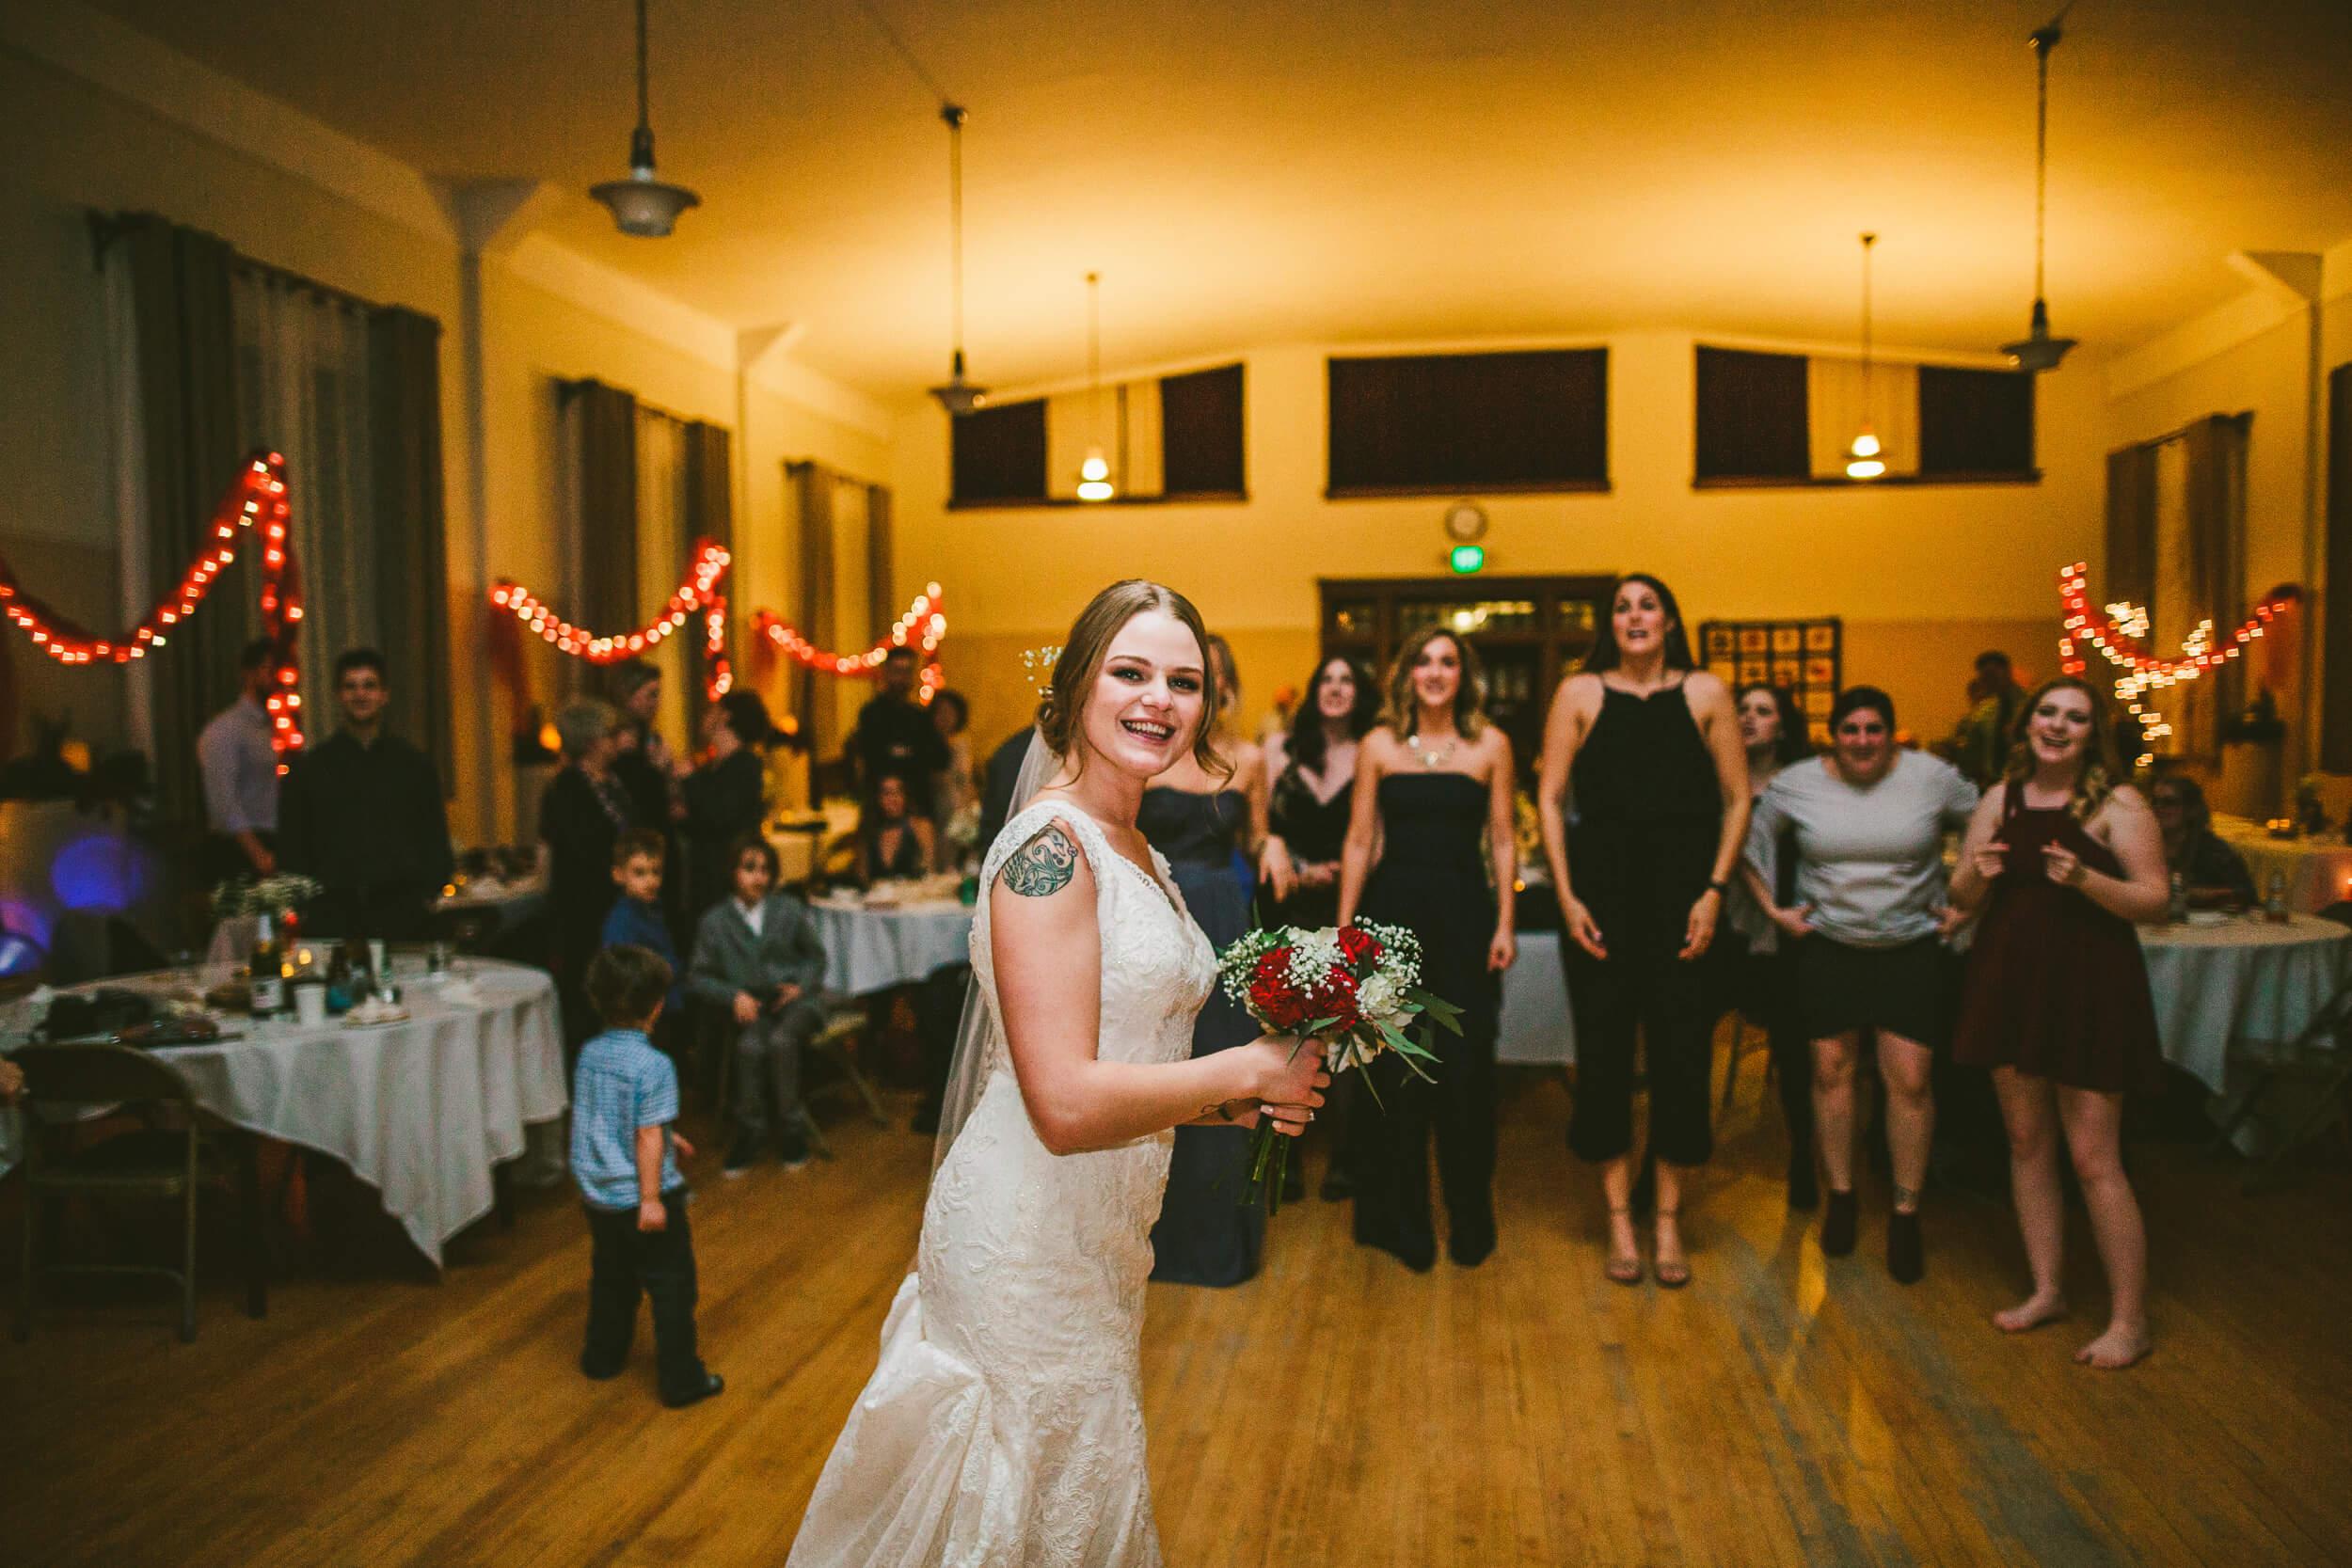 mukogawa winter wedding in spokane (342).jpg